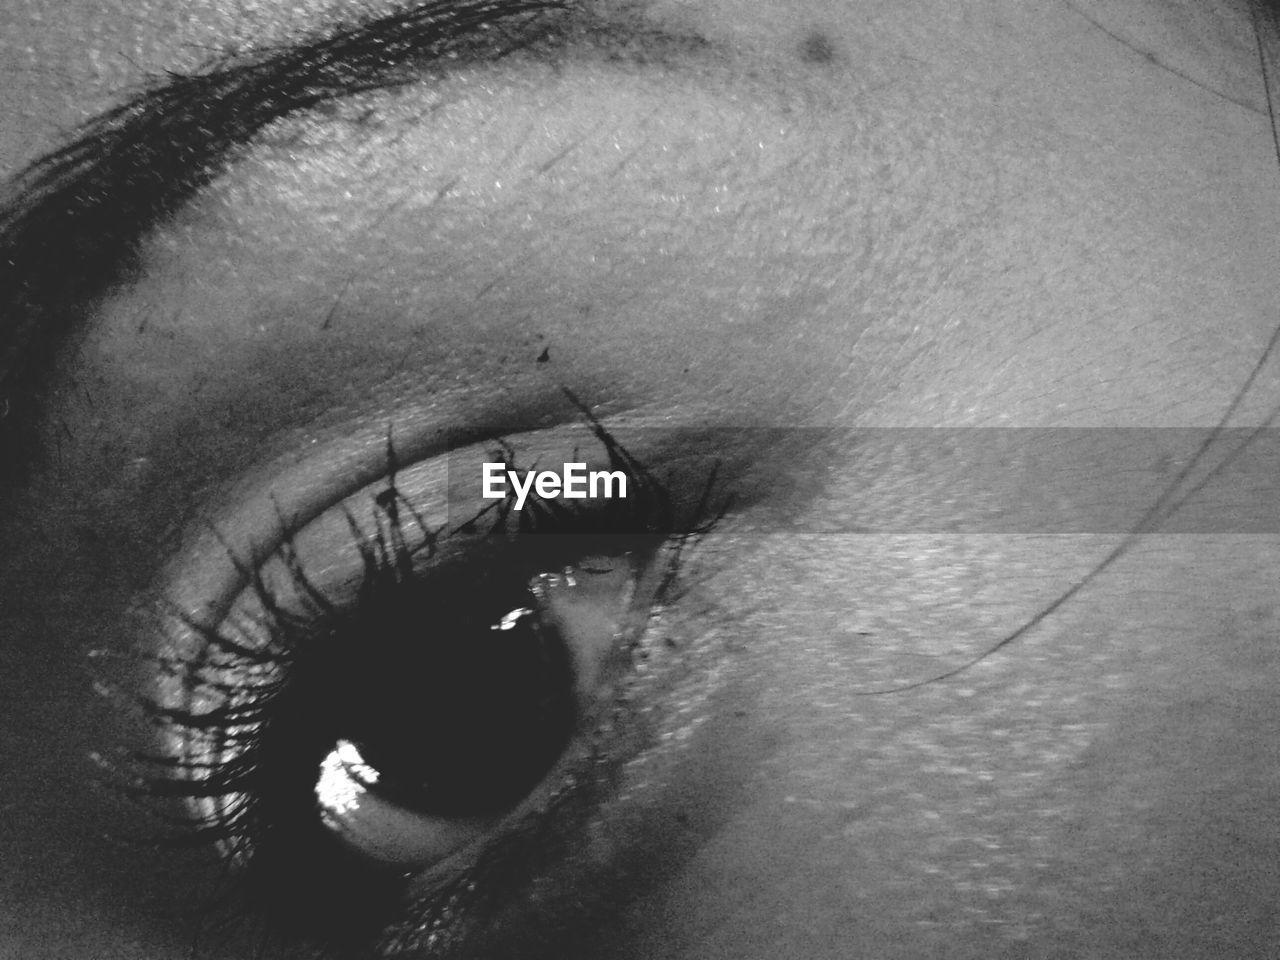 human body part, human eye, one person, real people, sensory perception, eyelash, eyesight, close-up, human skin, eyeball, outdoors, day, people